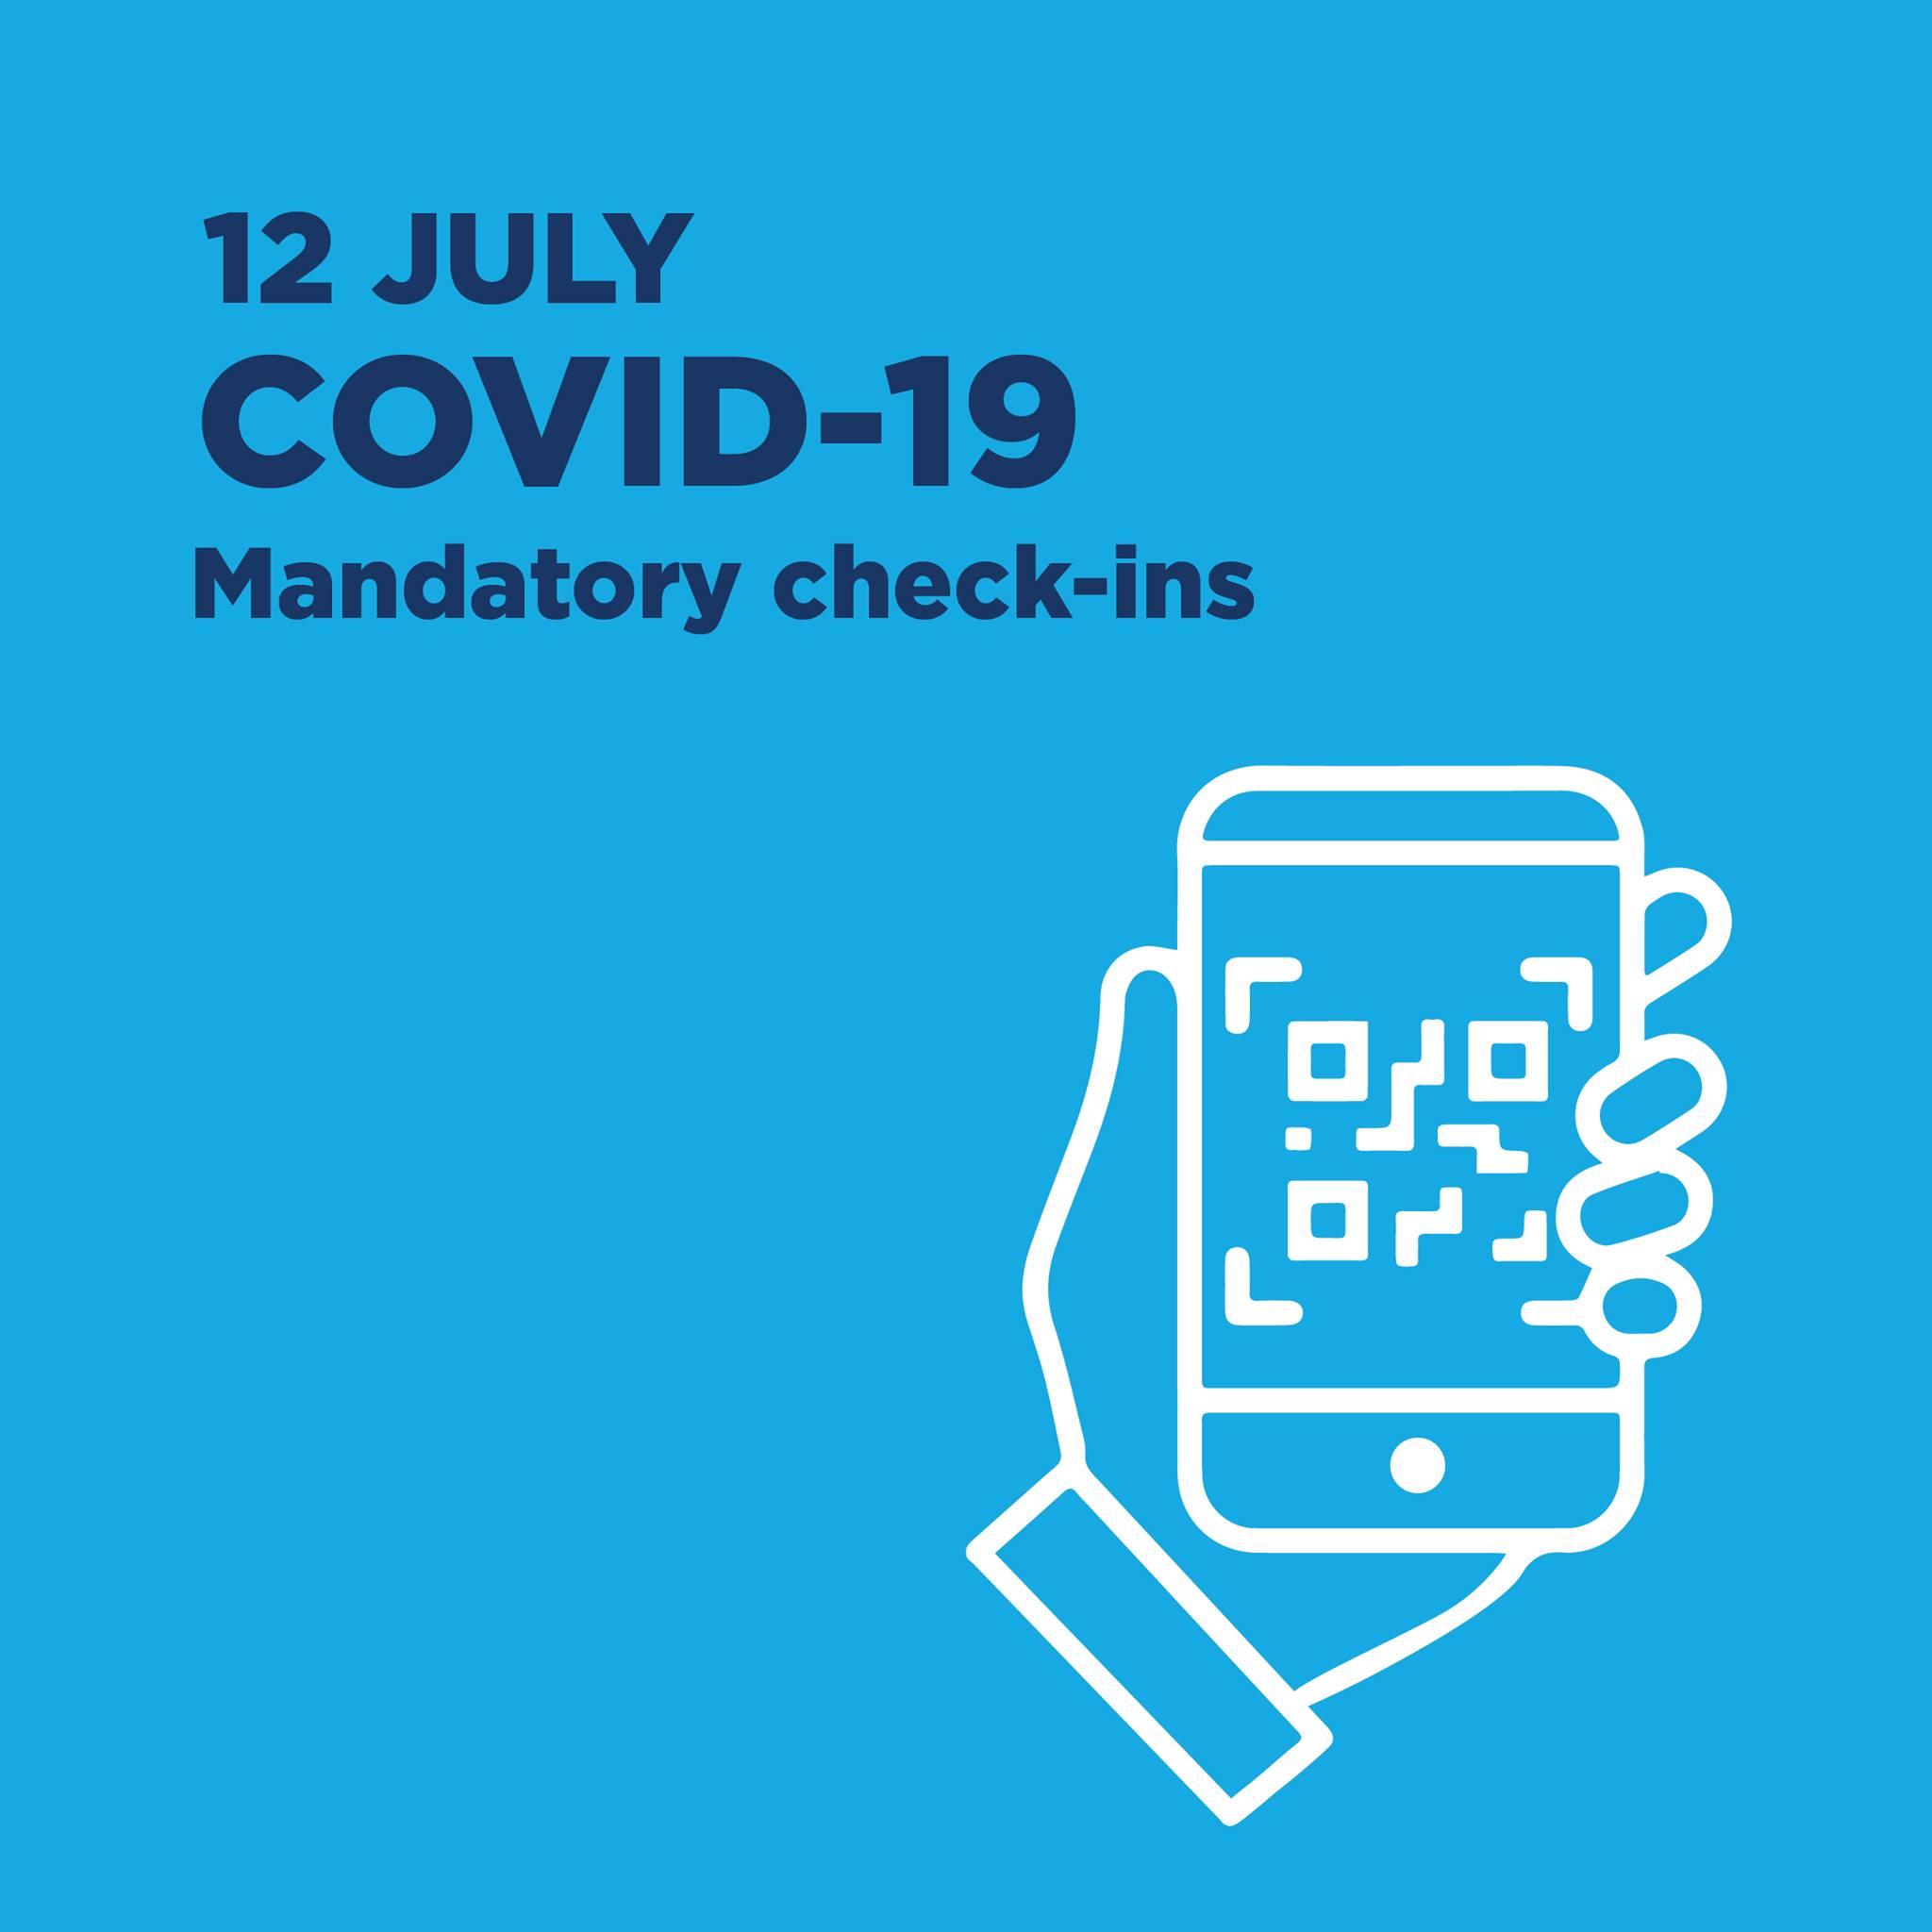 Mandatory Check-ins